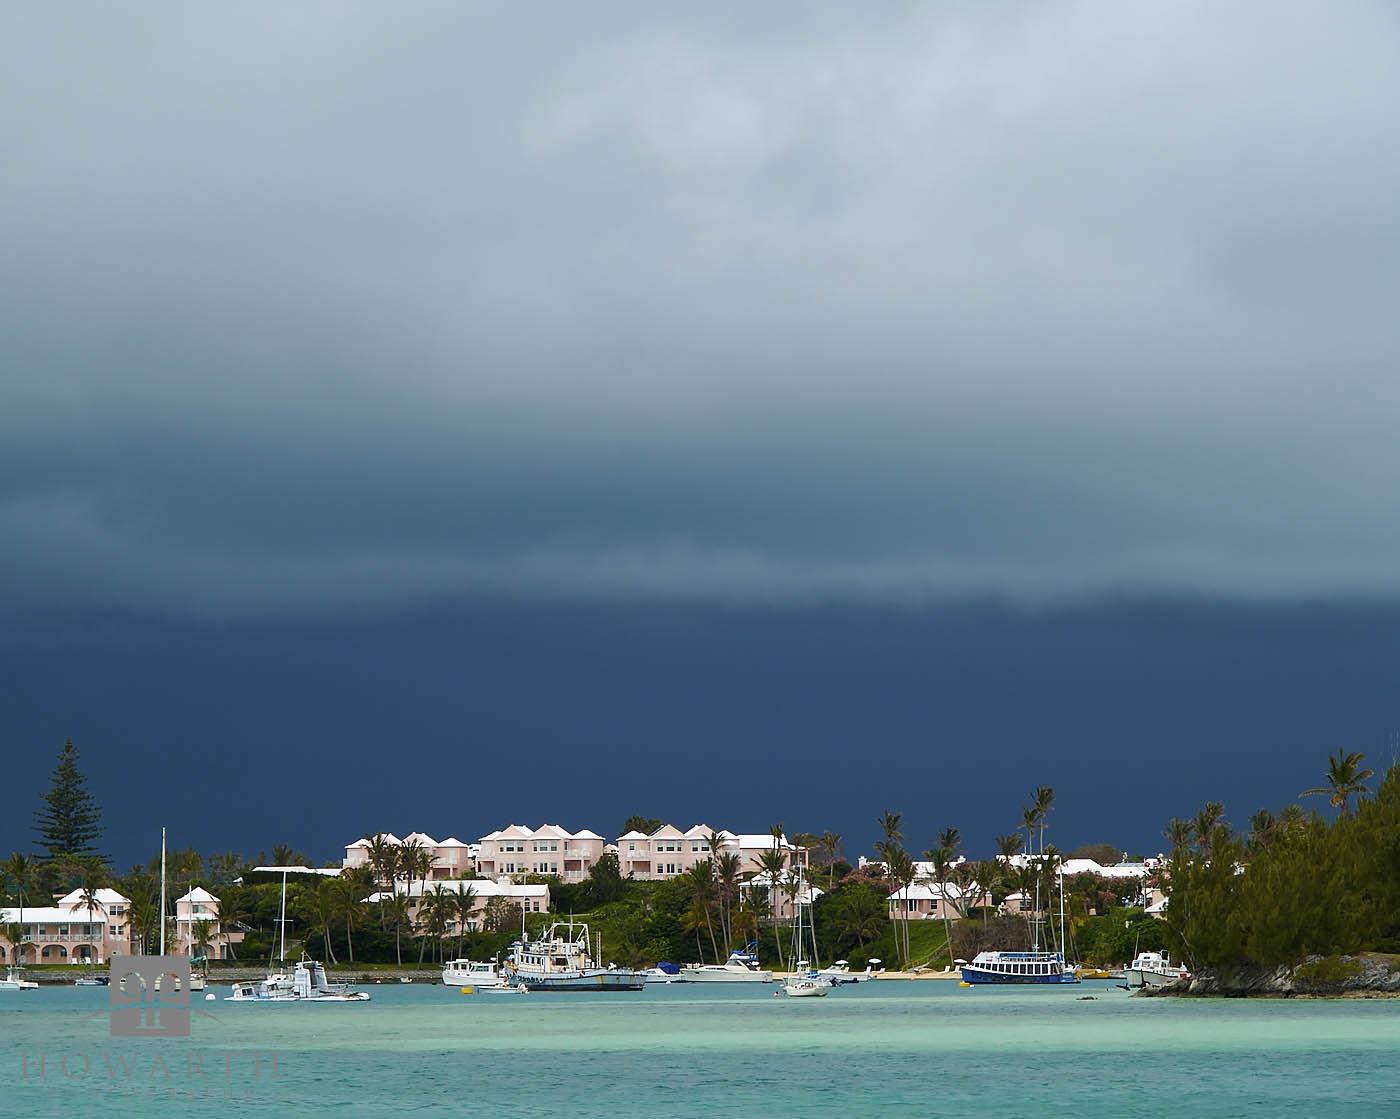 cambridge, squall, storm, rain, cloud, somerset, mangrove, bay, beaches, resort, photo